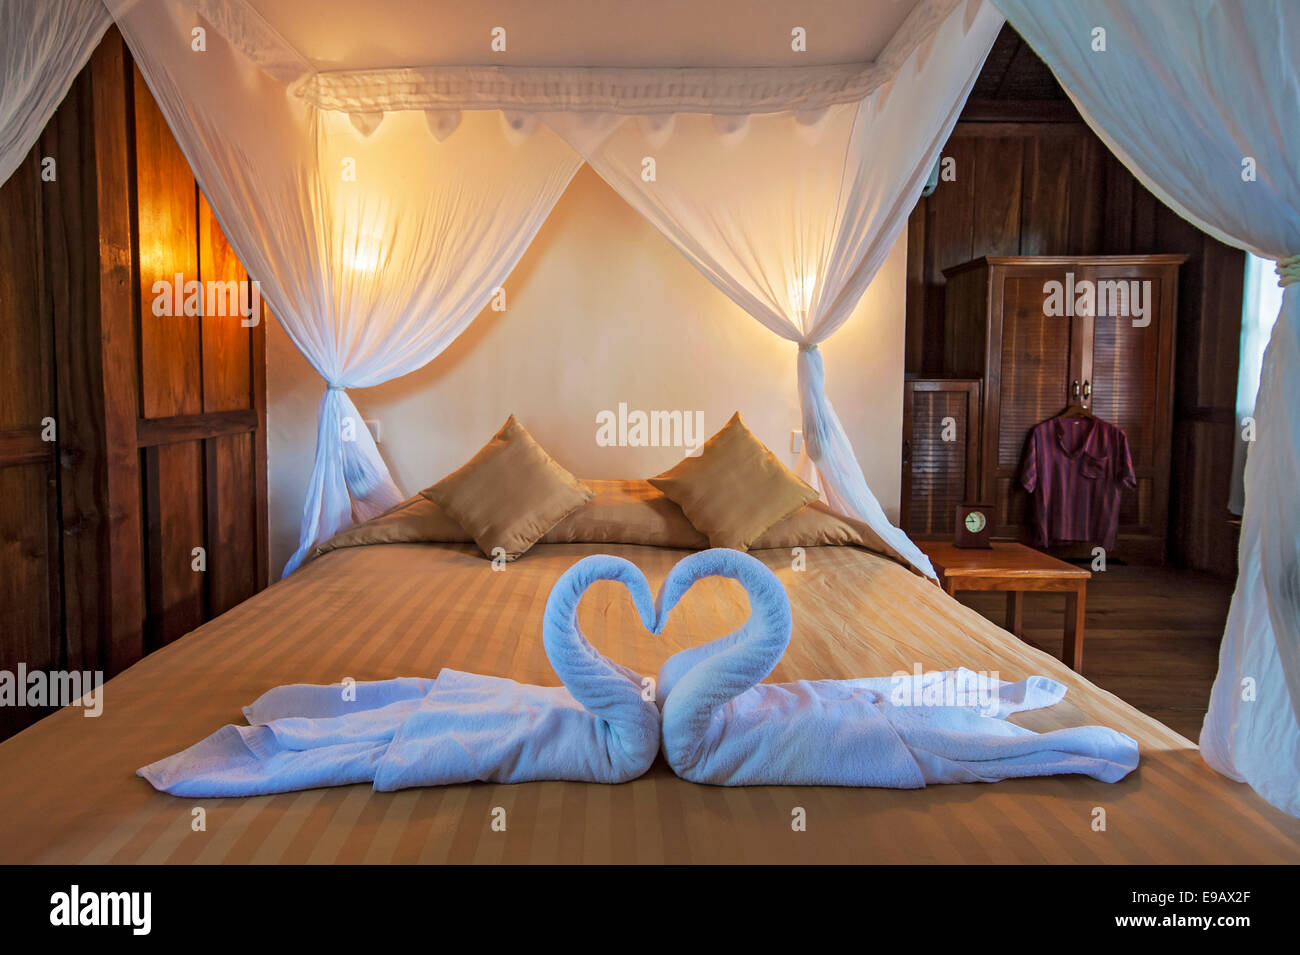 Bed in Palm Bungalow, Wakatobi Dive Resort, Sulawesi, Indonesia - Stock Image